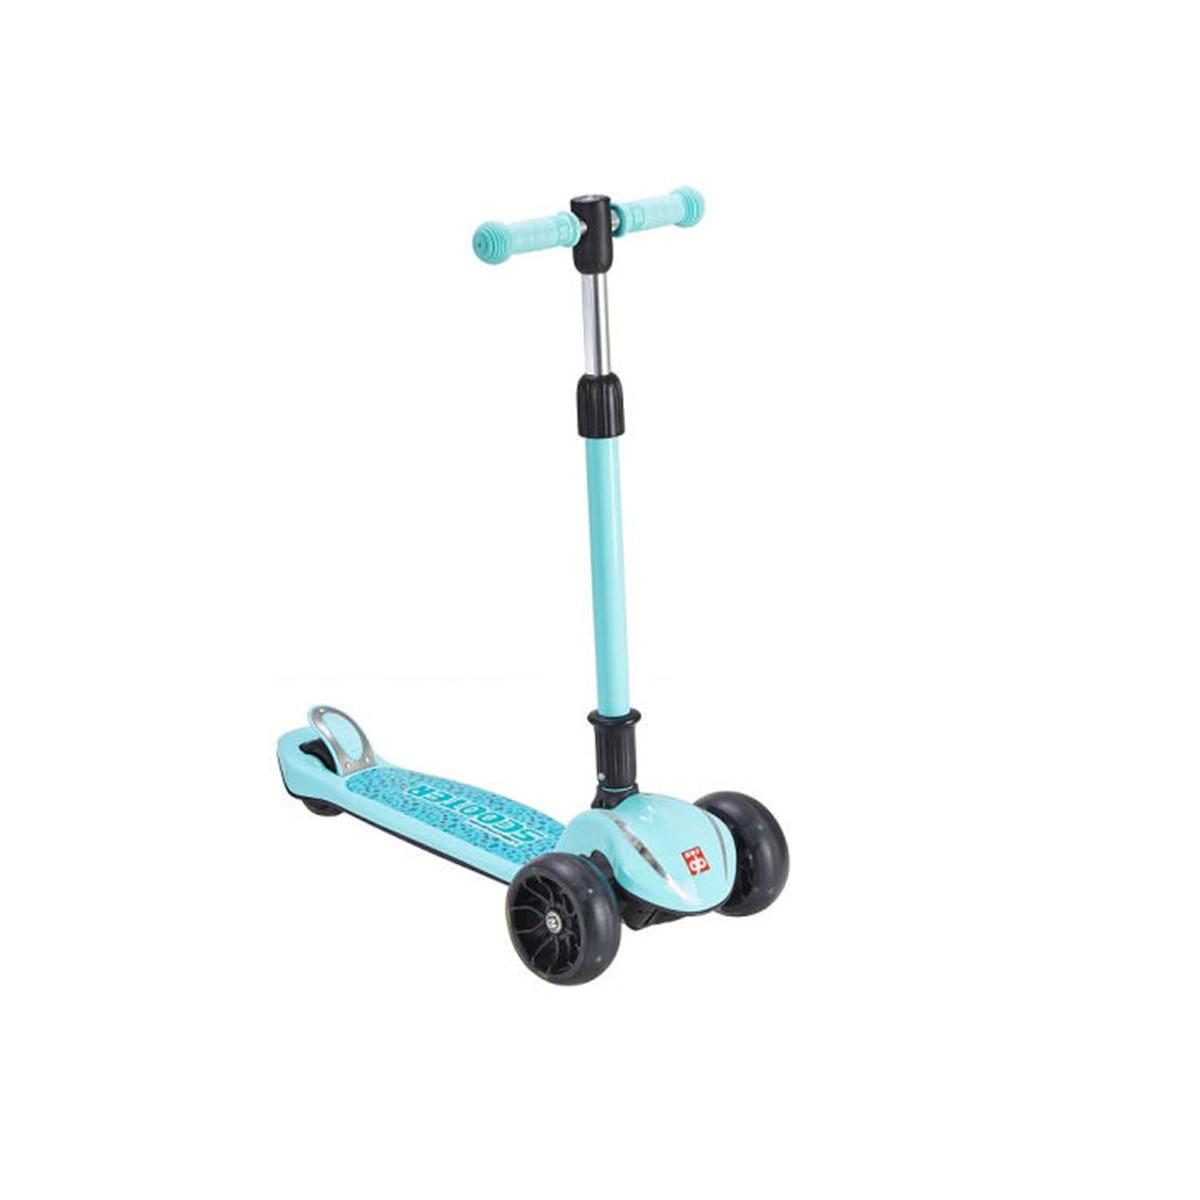 GoodBaby好孩子 儿童滑板车 3-10岁宝宝玩具代步车 三轮踏板车 蓝色SC400-Q202BB